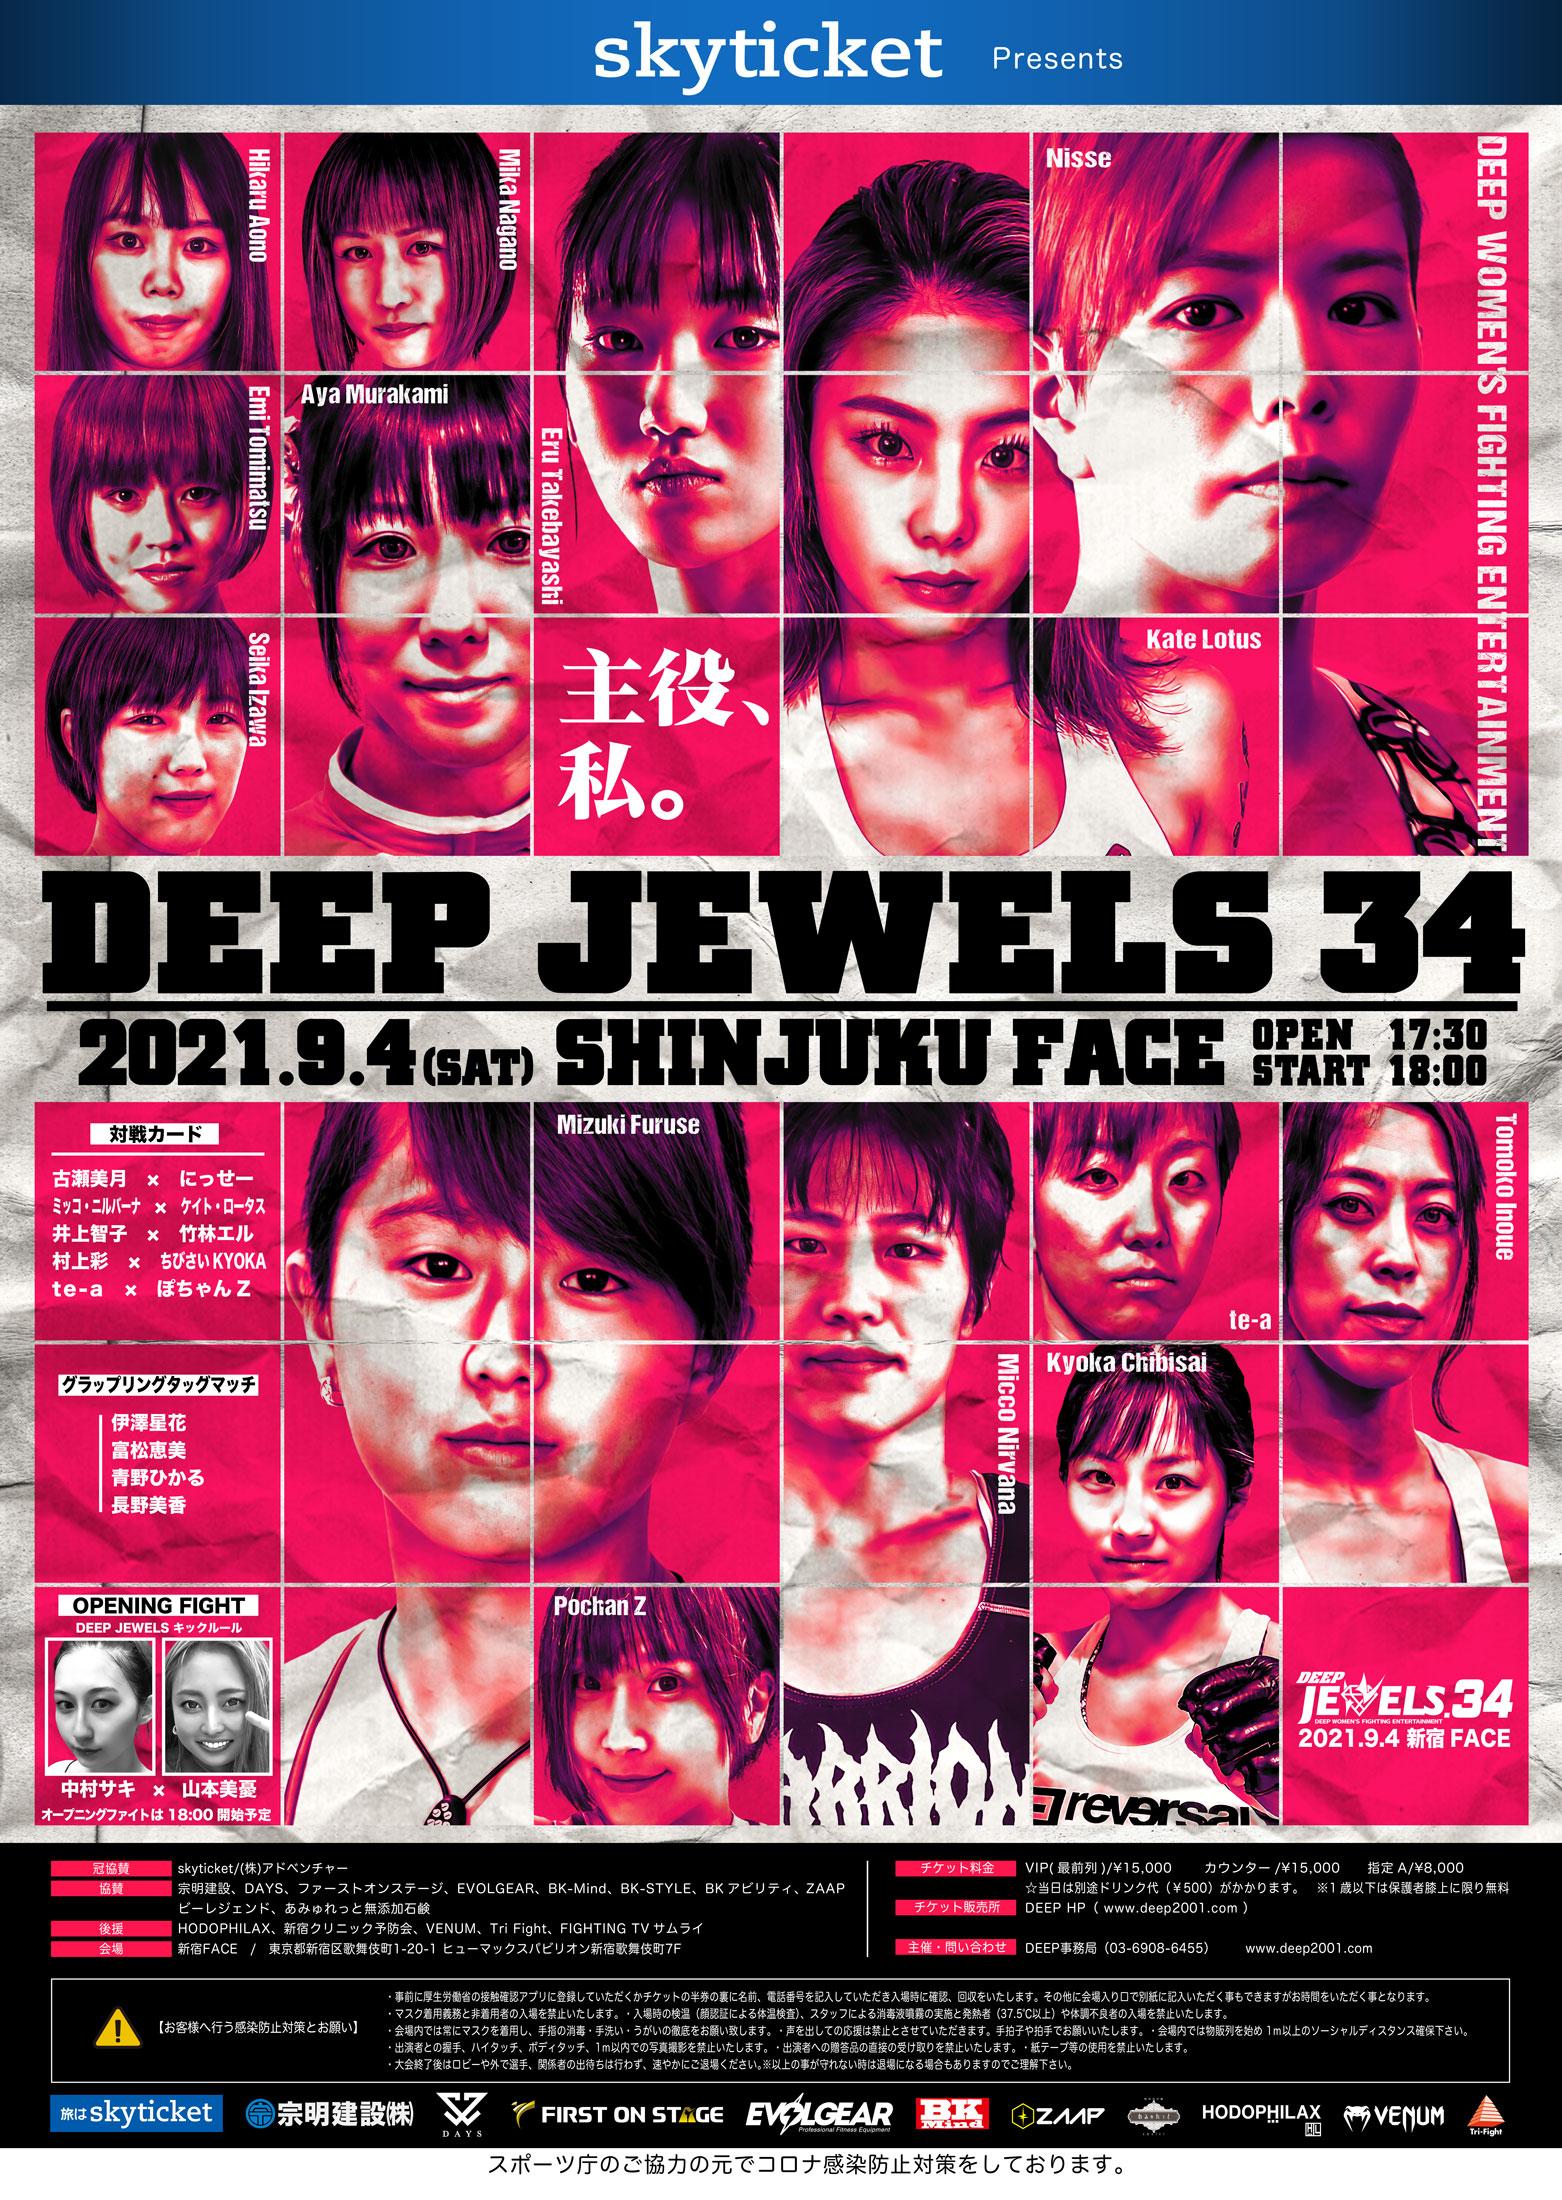 DEEP JEWELS 34